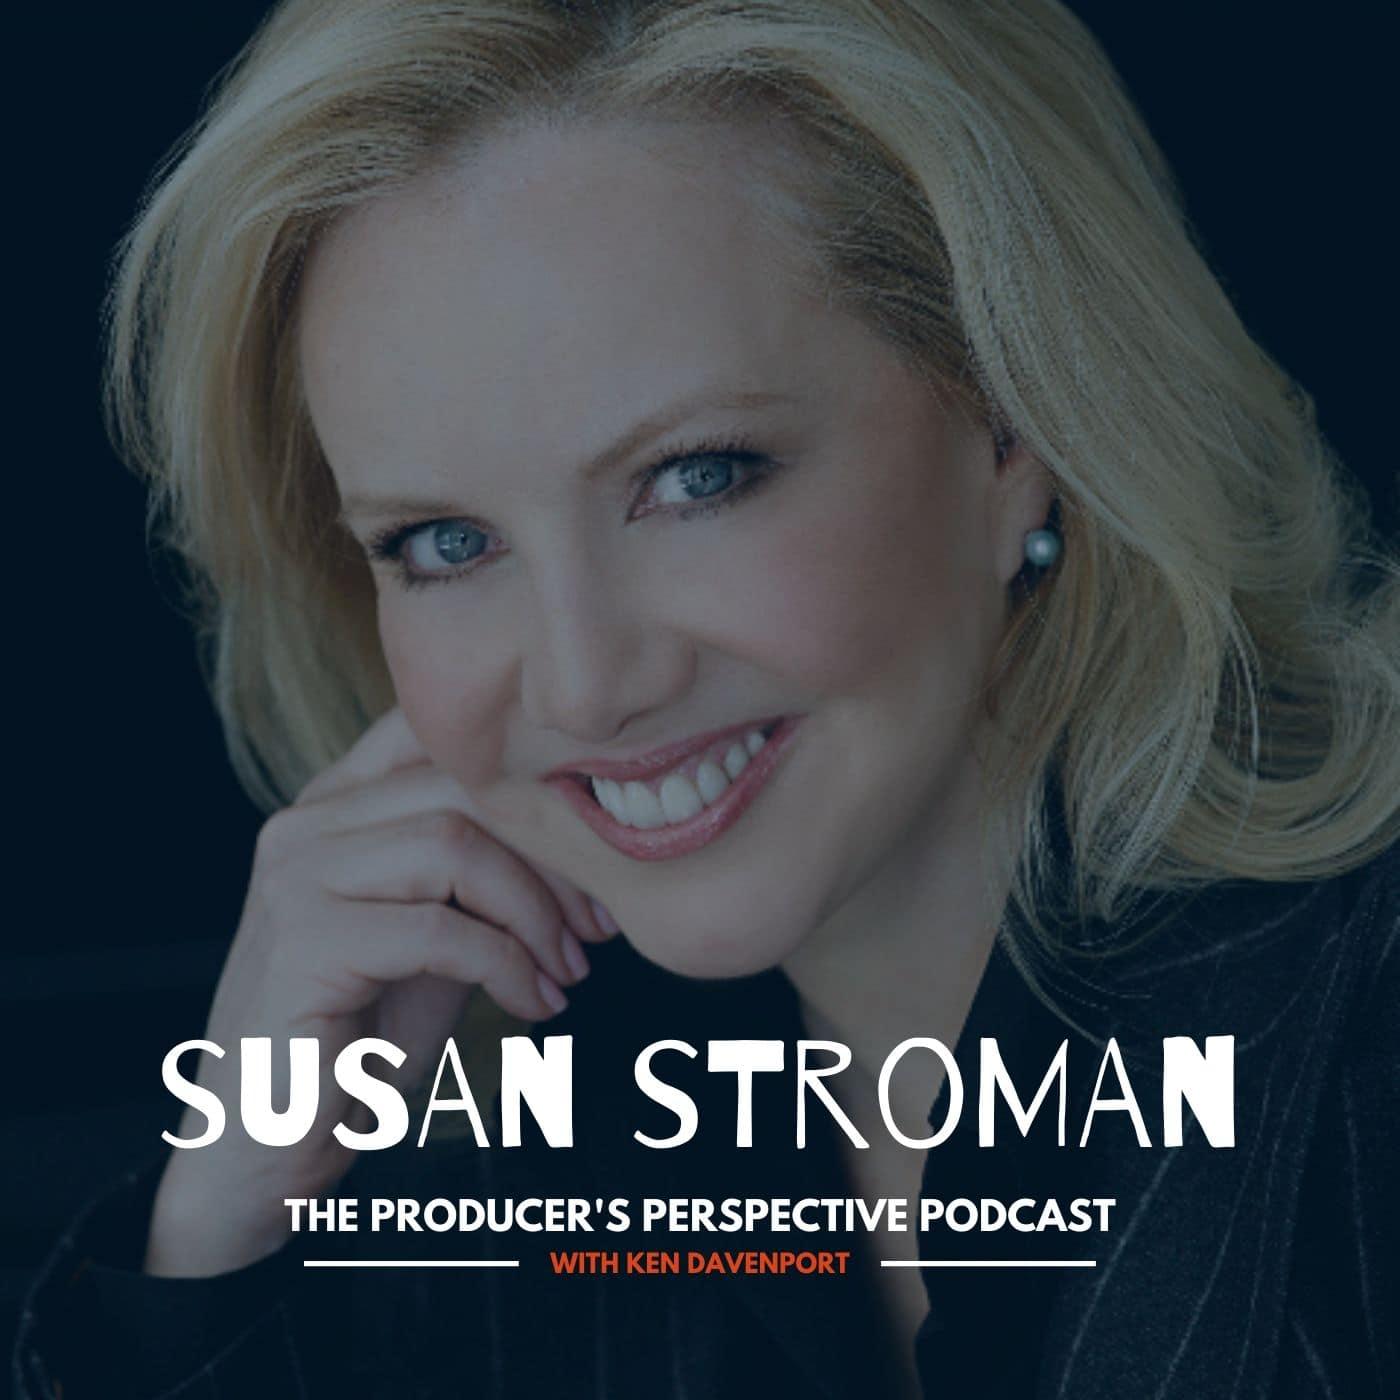 Ken Davenport's The Producer's Perspective Podcast Episode 46 - Susan Stroman